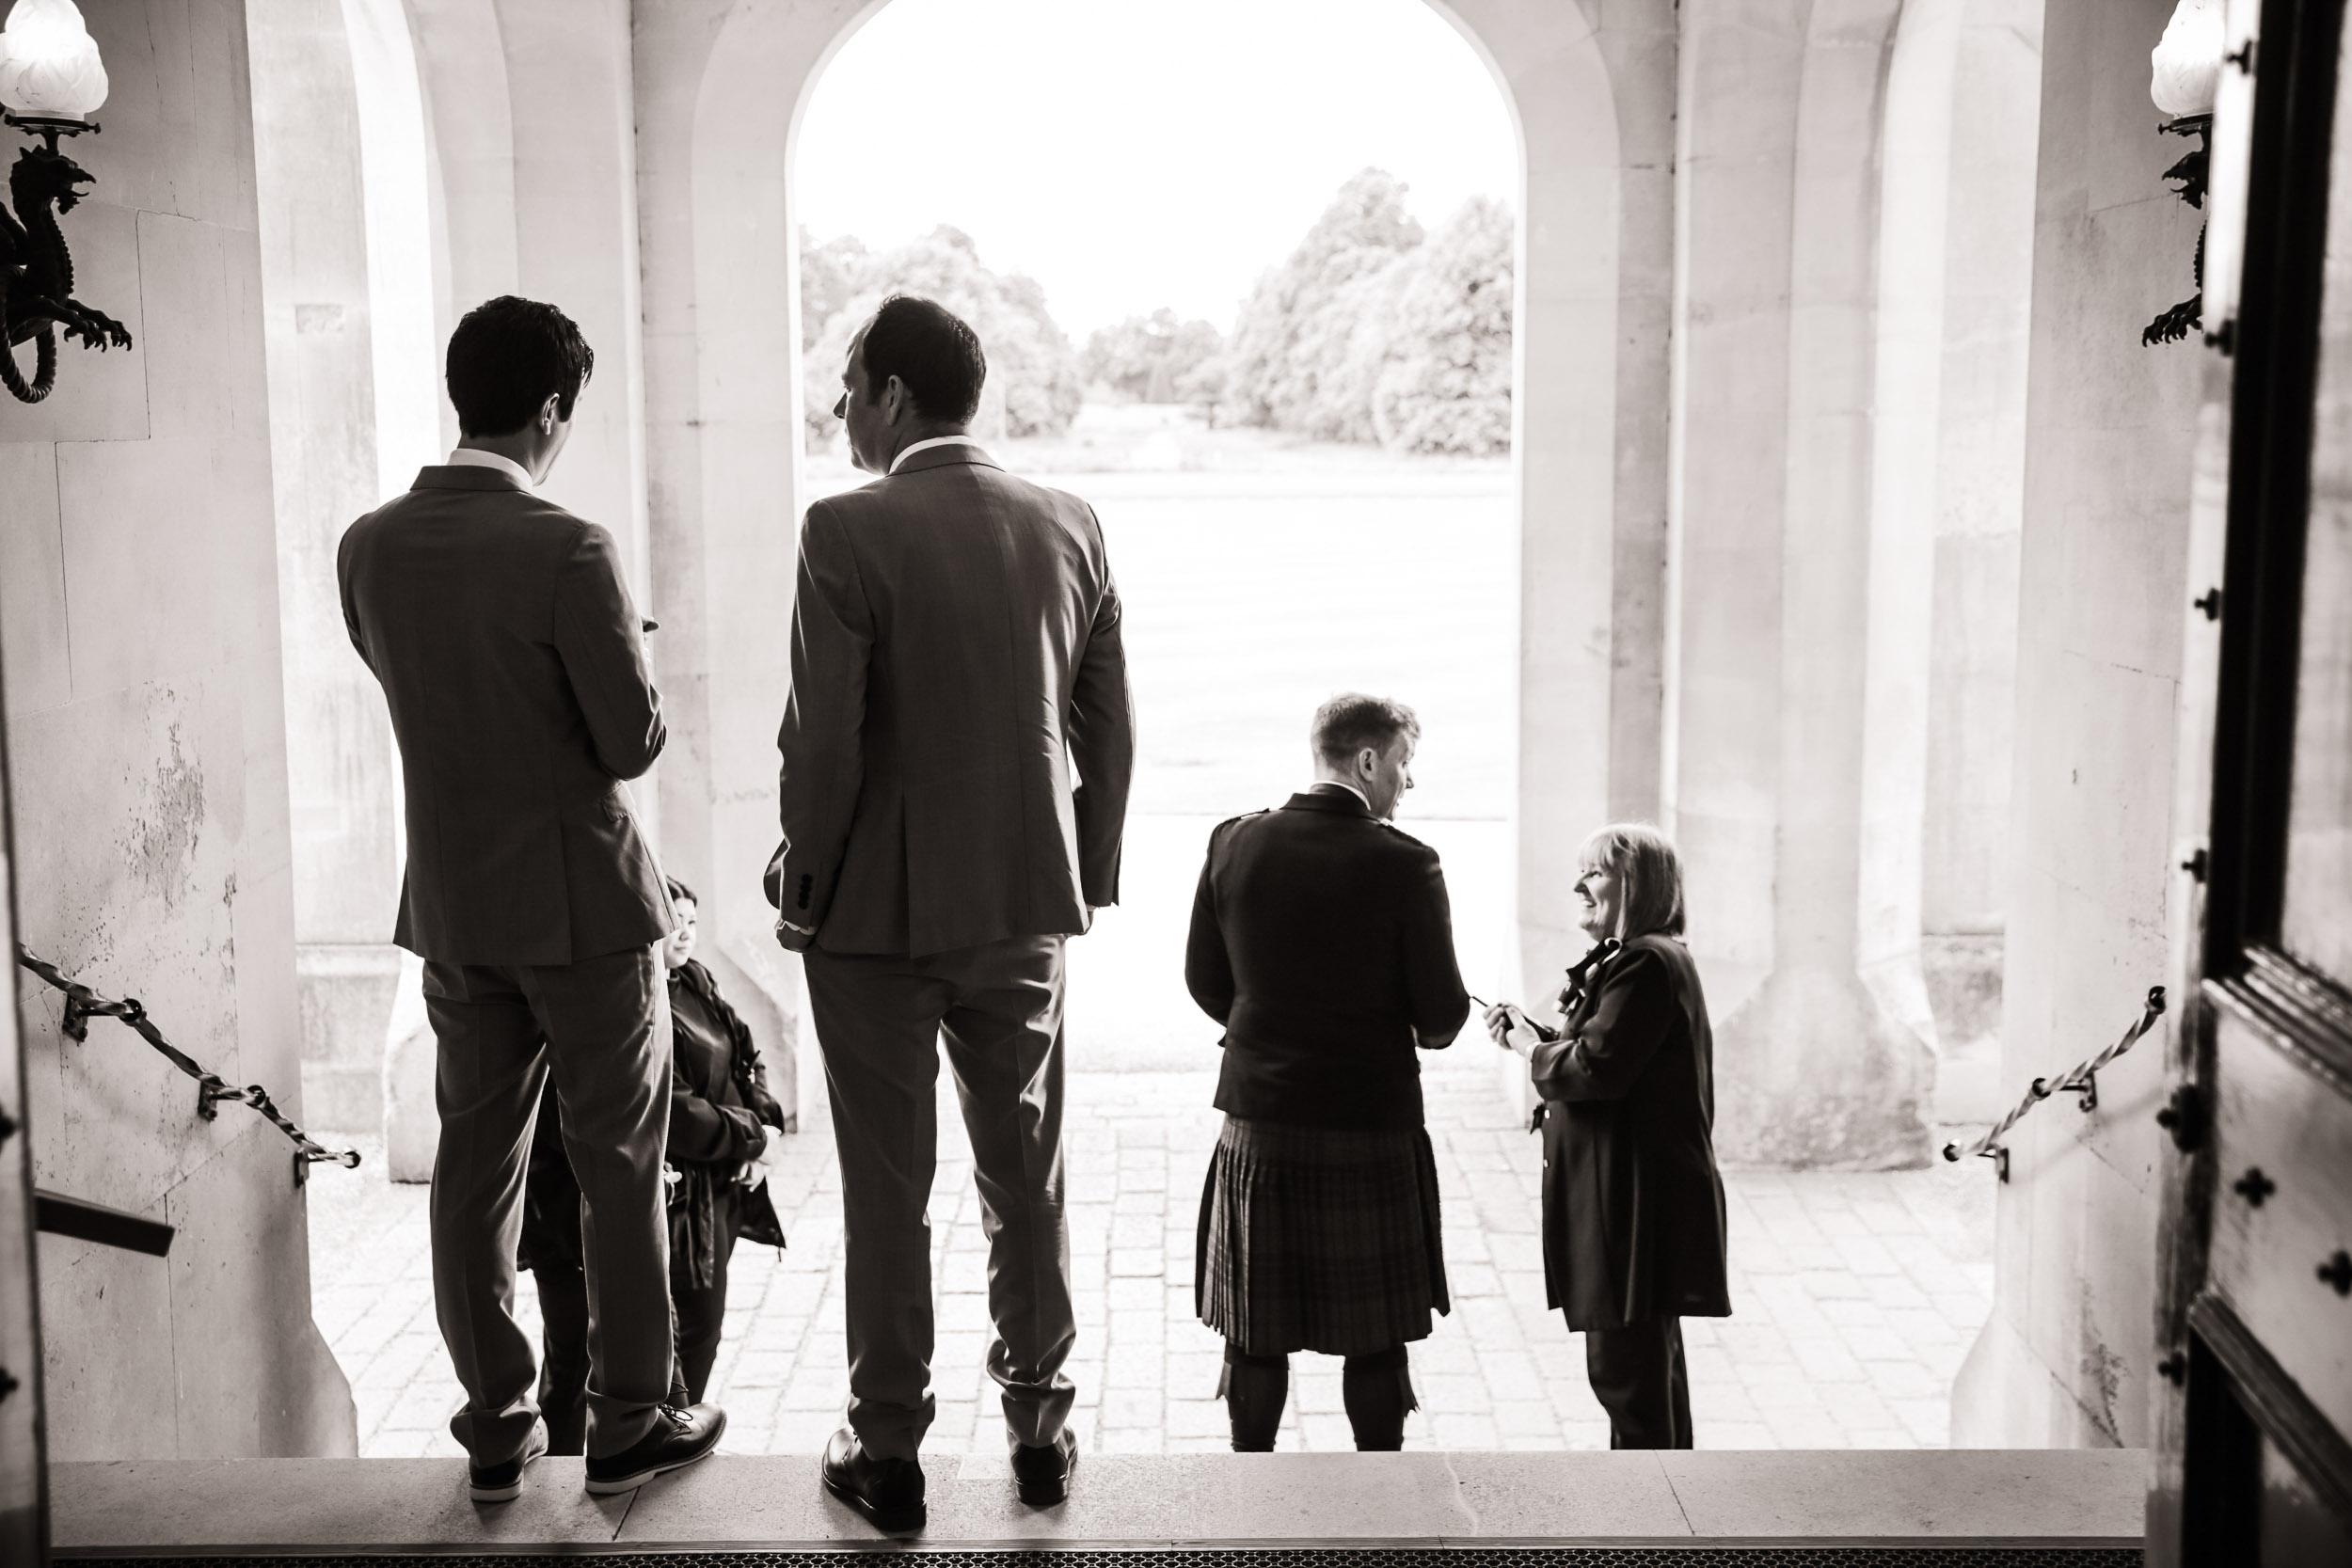 syon-house-wedding-photographer-london 025.jpg